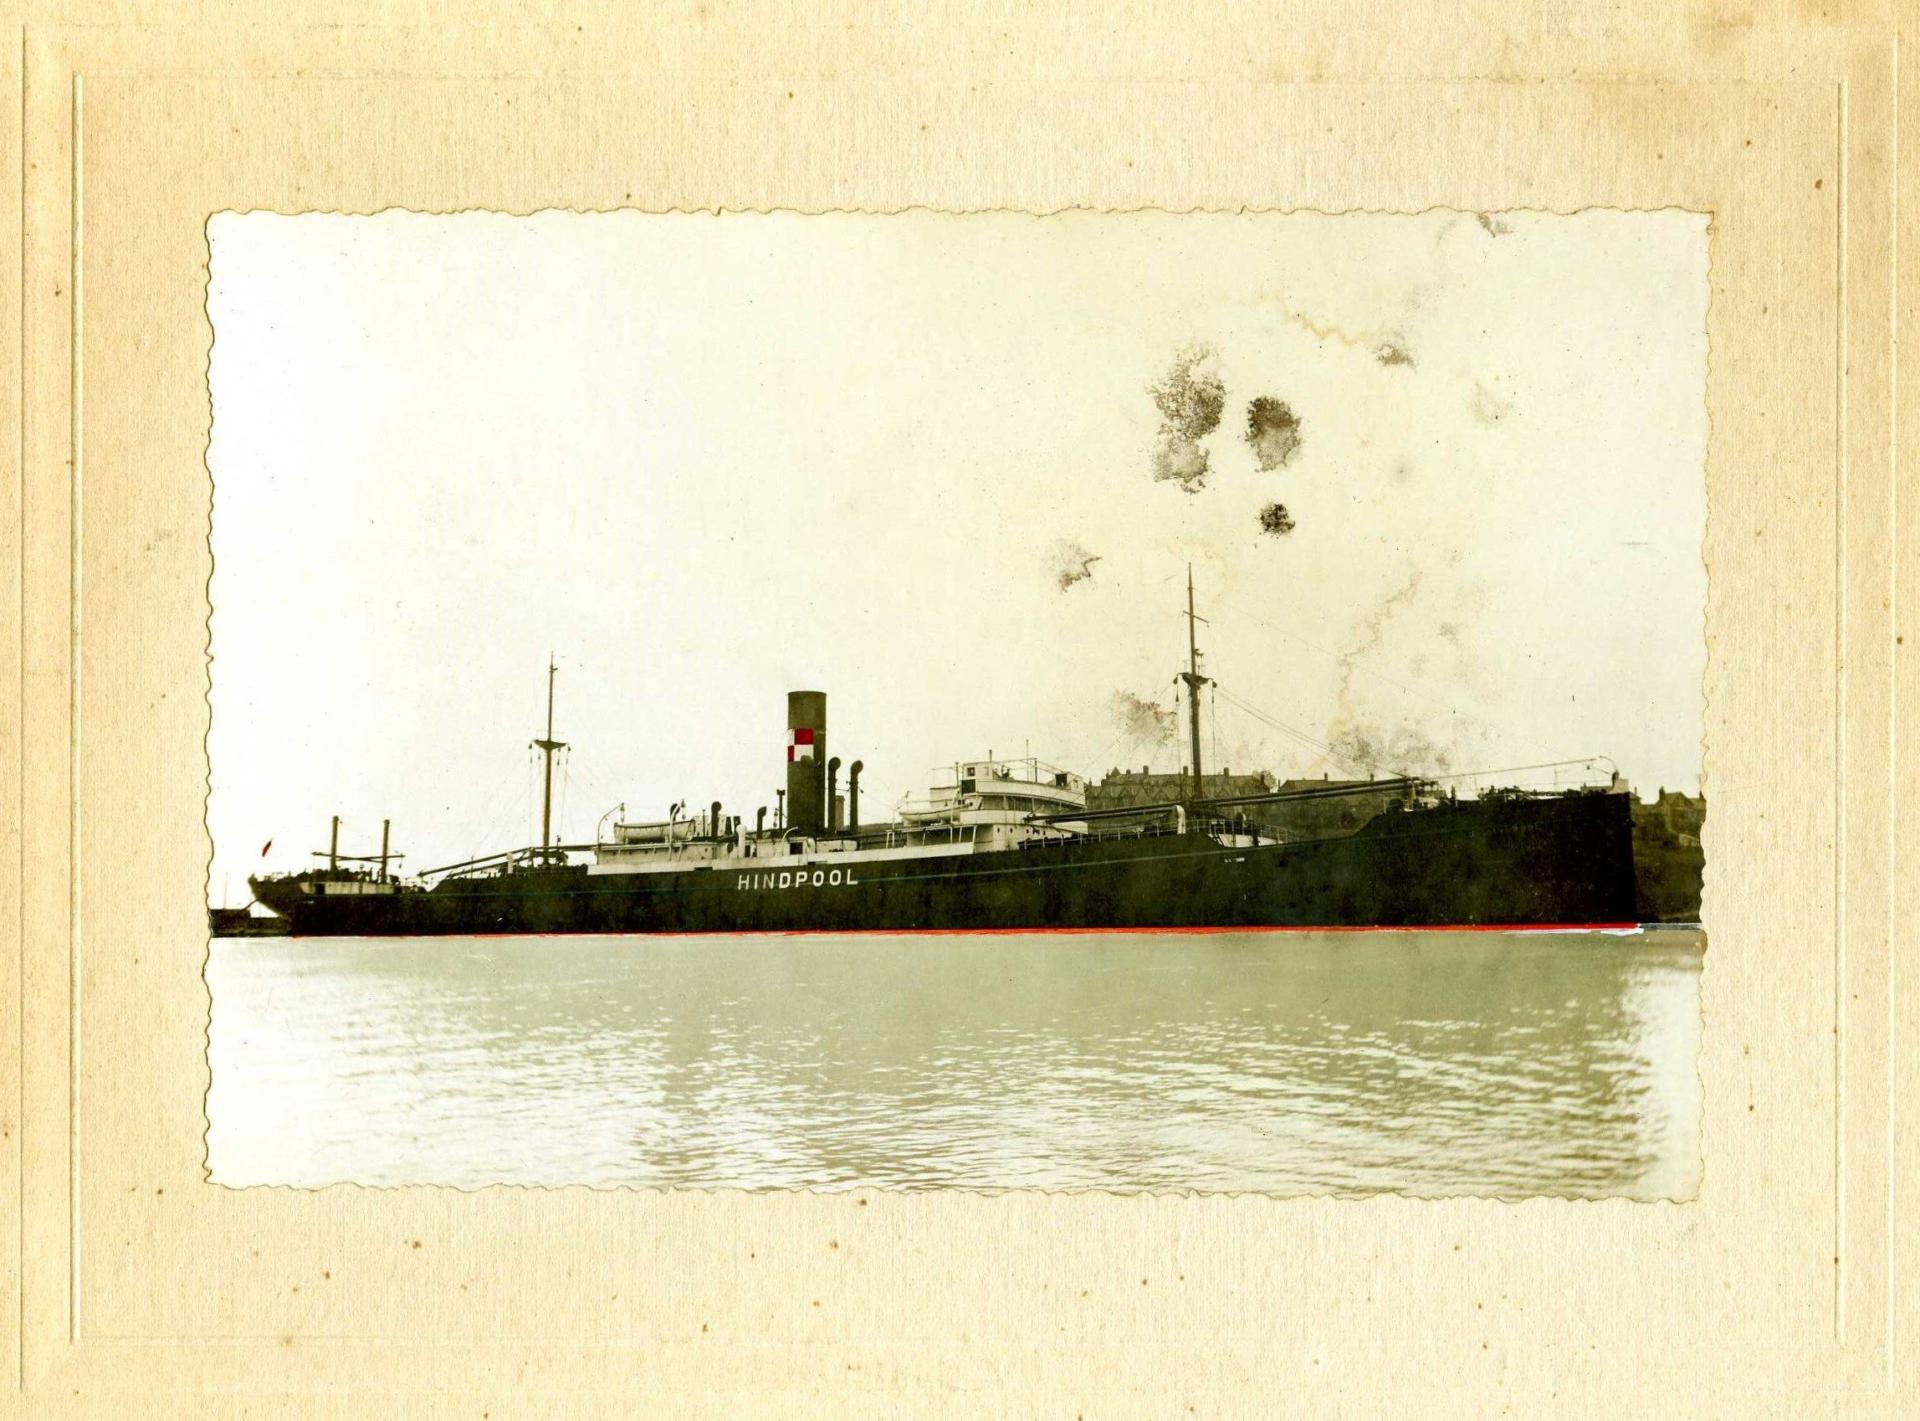 Sepia photo of the Hindpool Ship